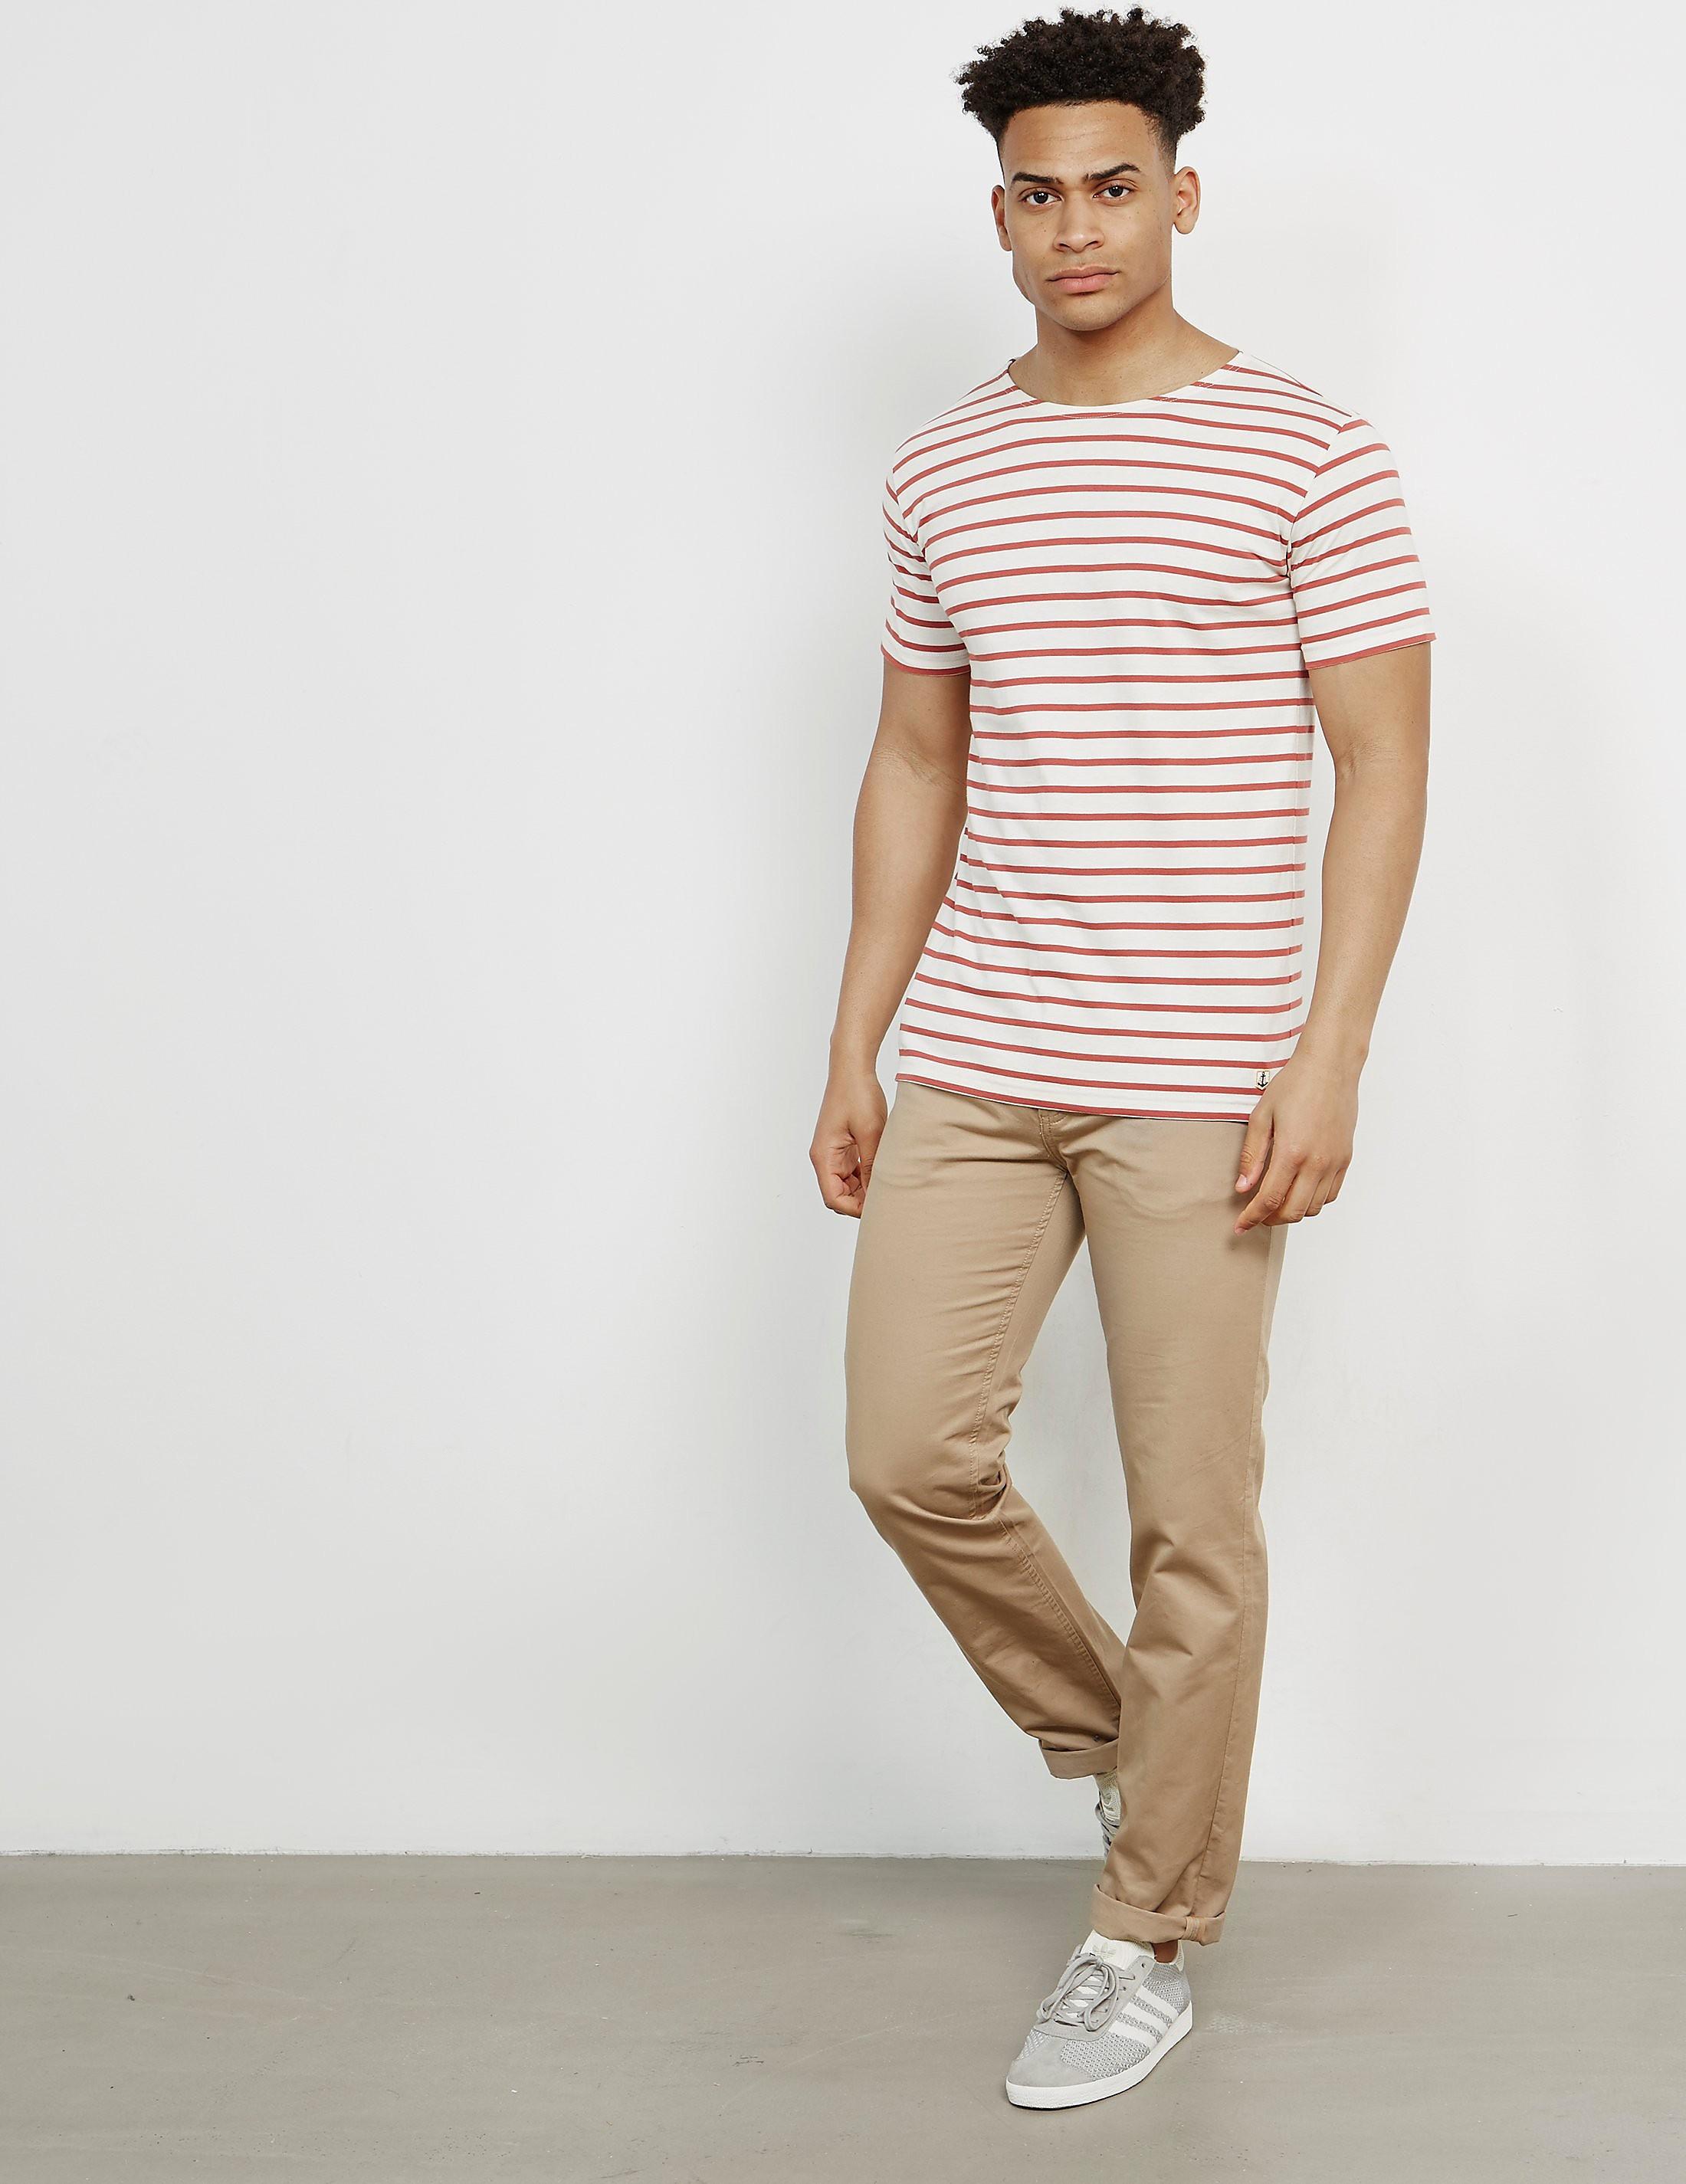 Armor Lux Sailor Short Sleeve T-Shirt